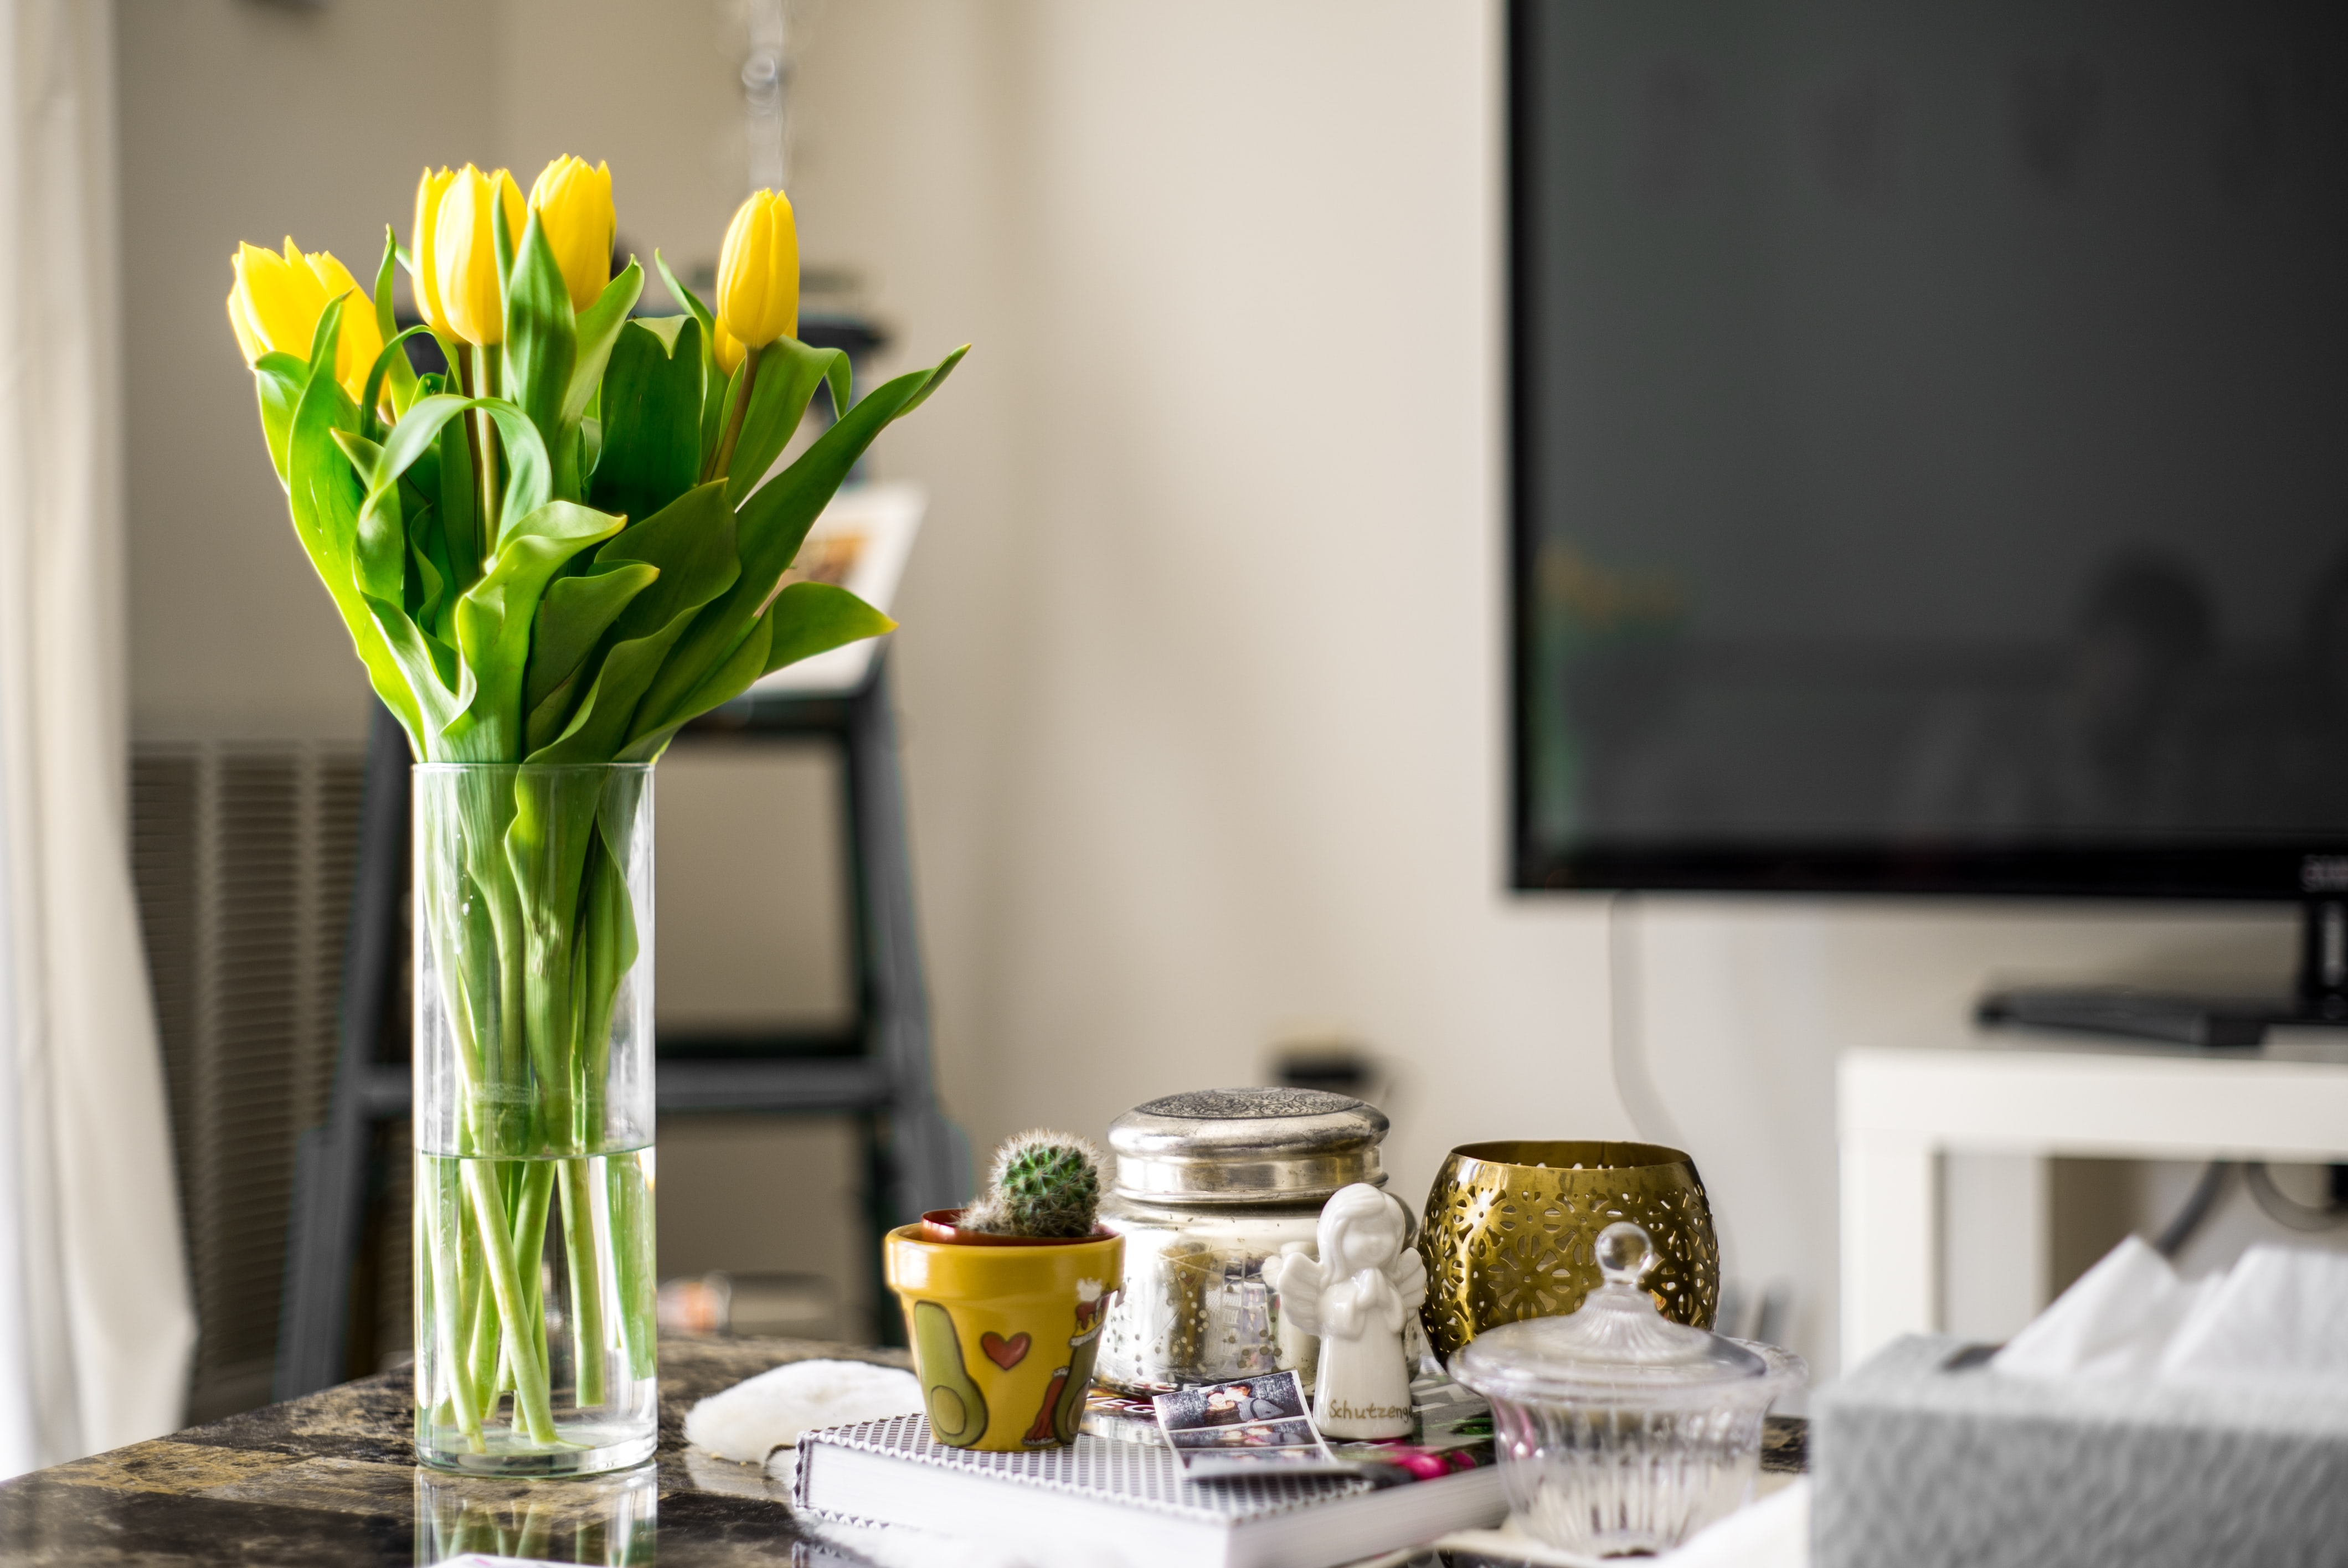 yellow tulip flowers inside vase on table